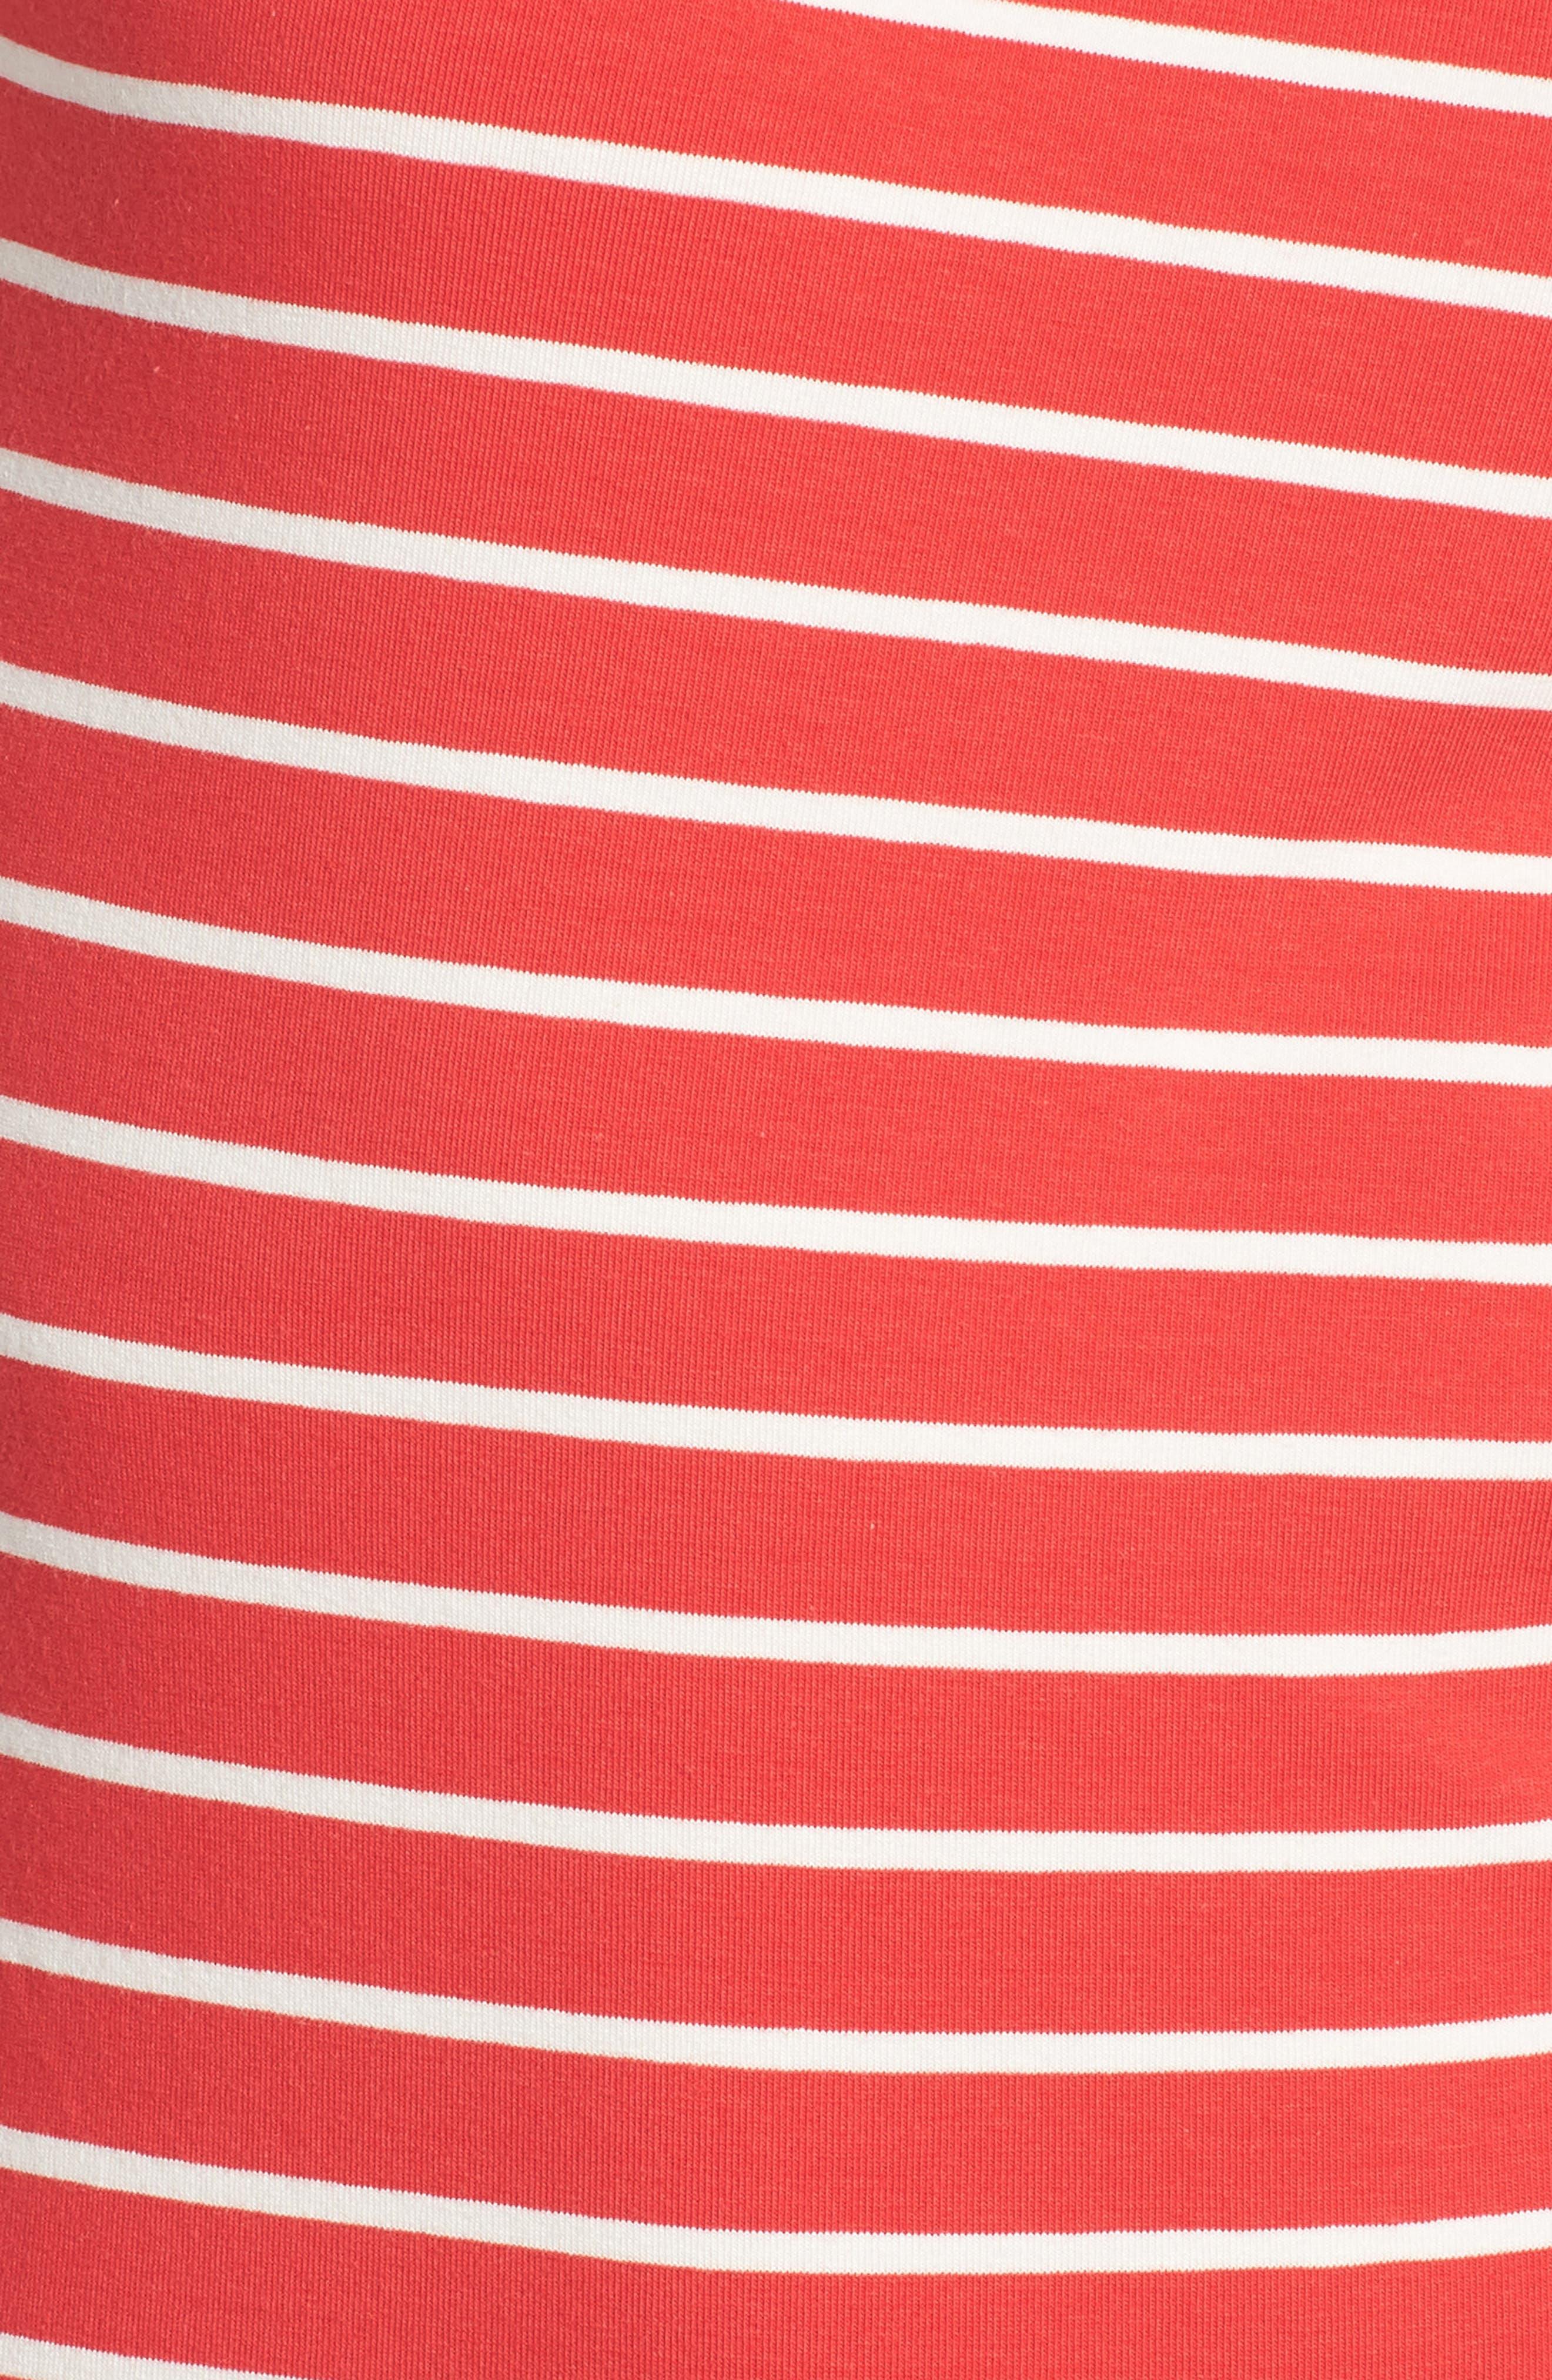 Knit Stripe Body-Con Dress,                             Alternate thumbnail 6, color,                             Shanghai Red/ Summer White